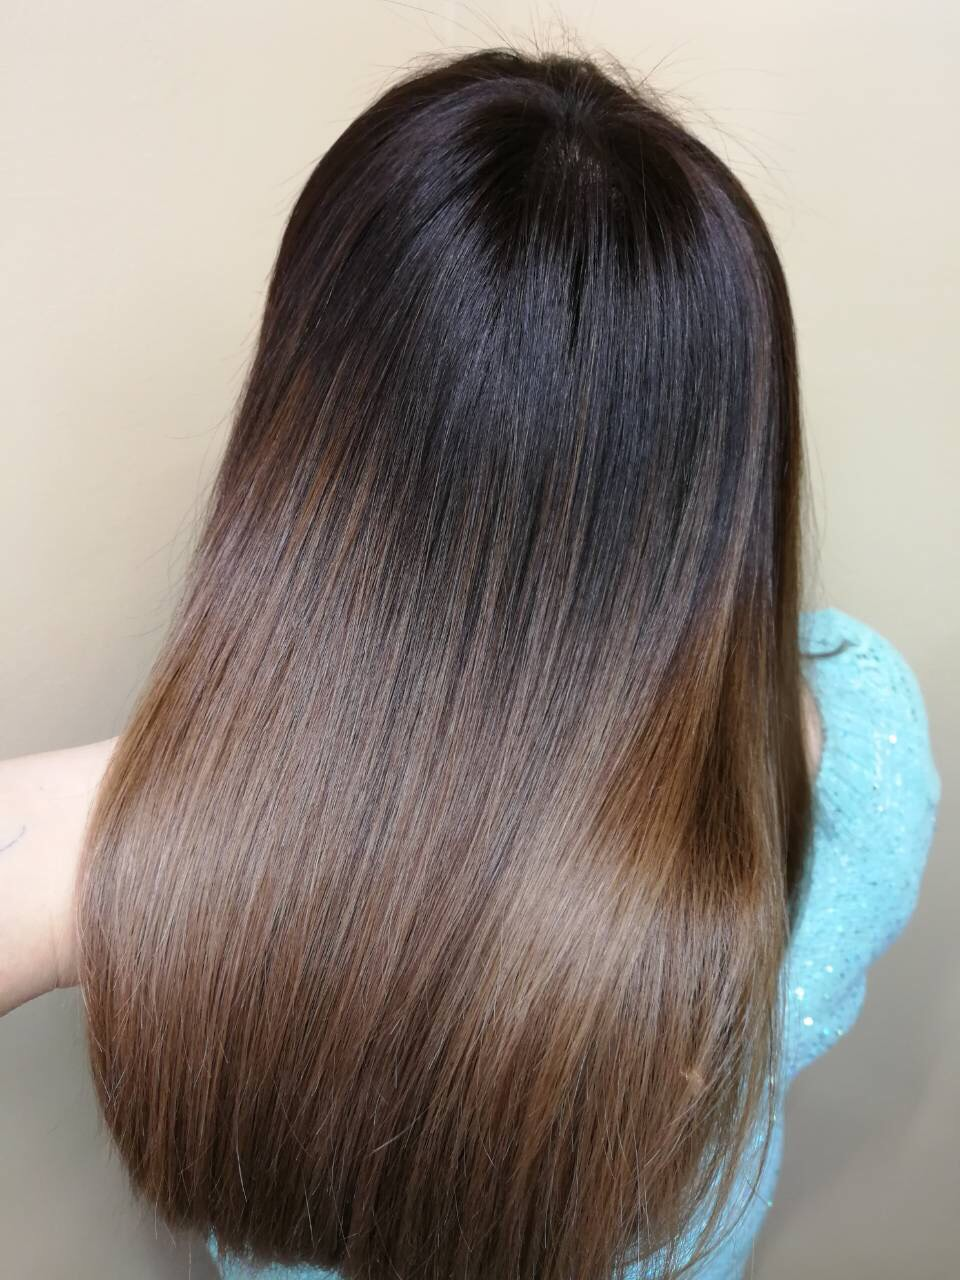 Окрашивание волос от 23 руб.